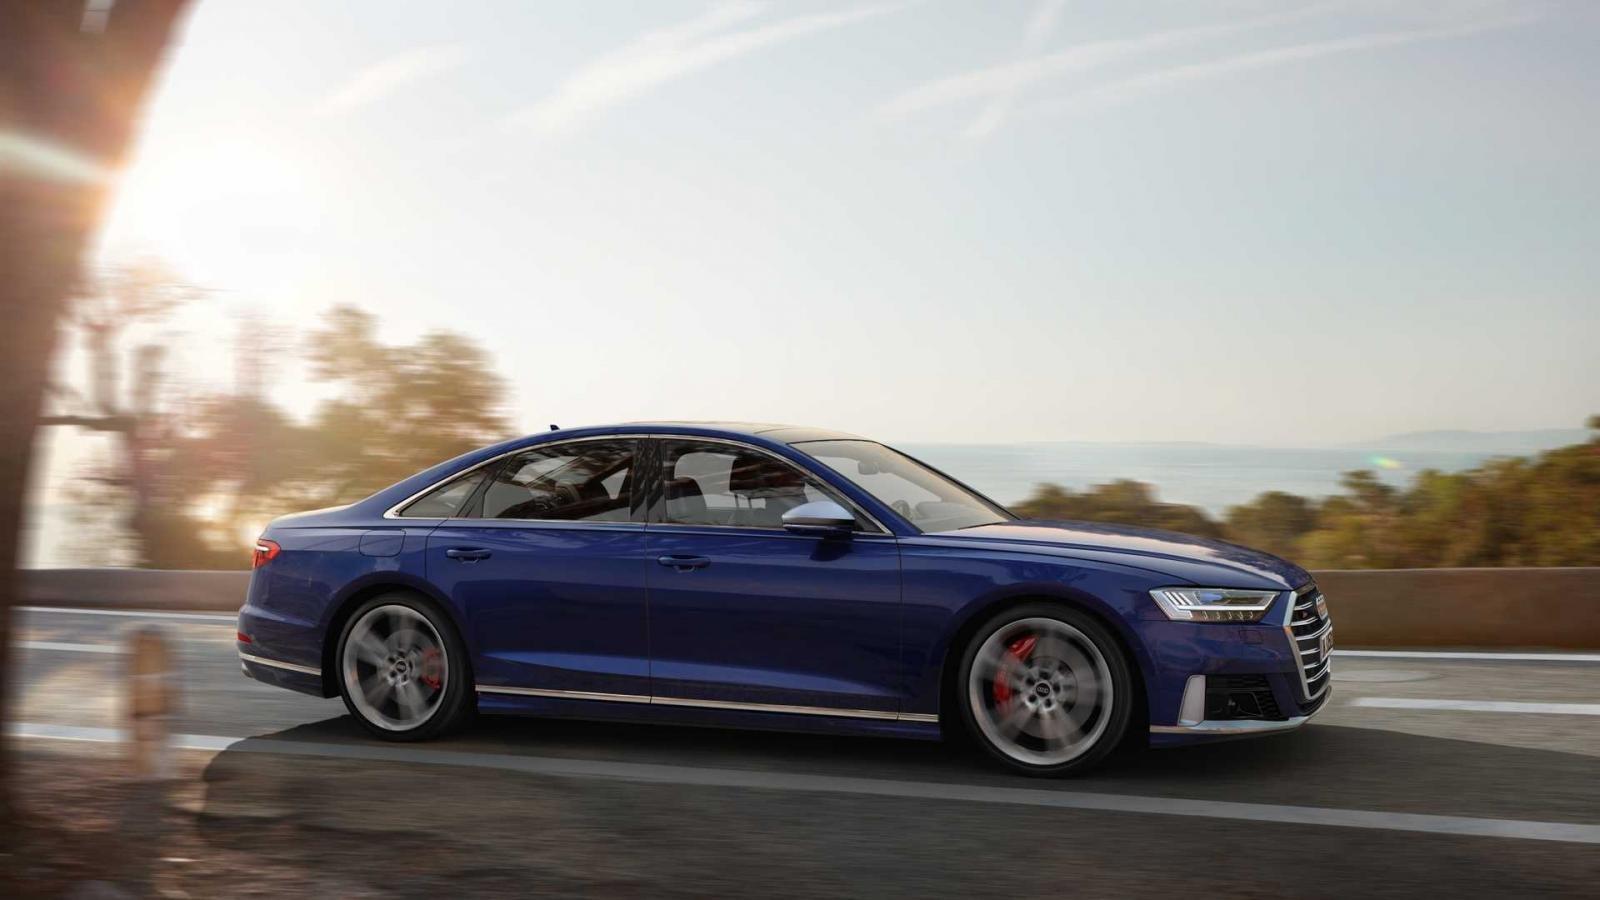 Đánh giá xe Audi S8 2020.